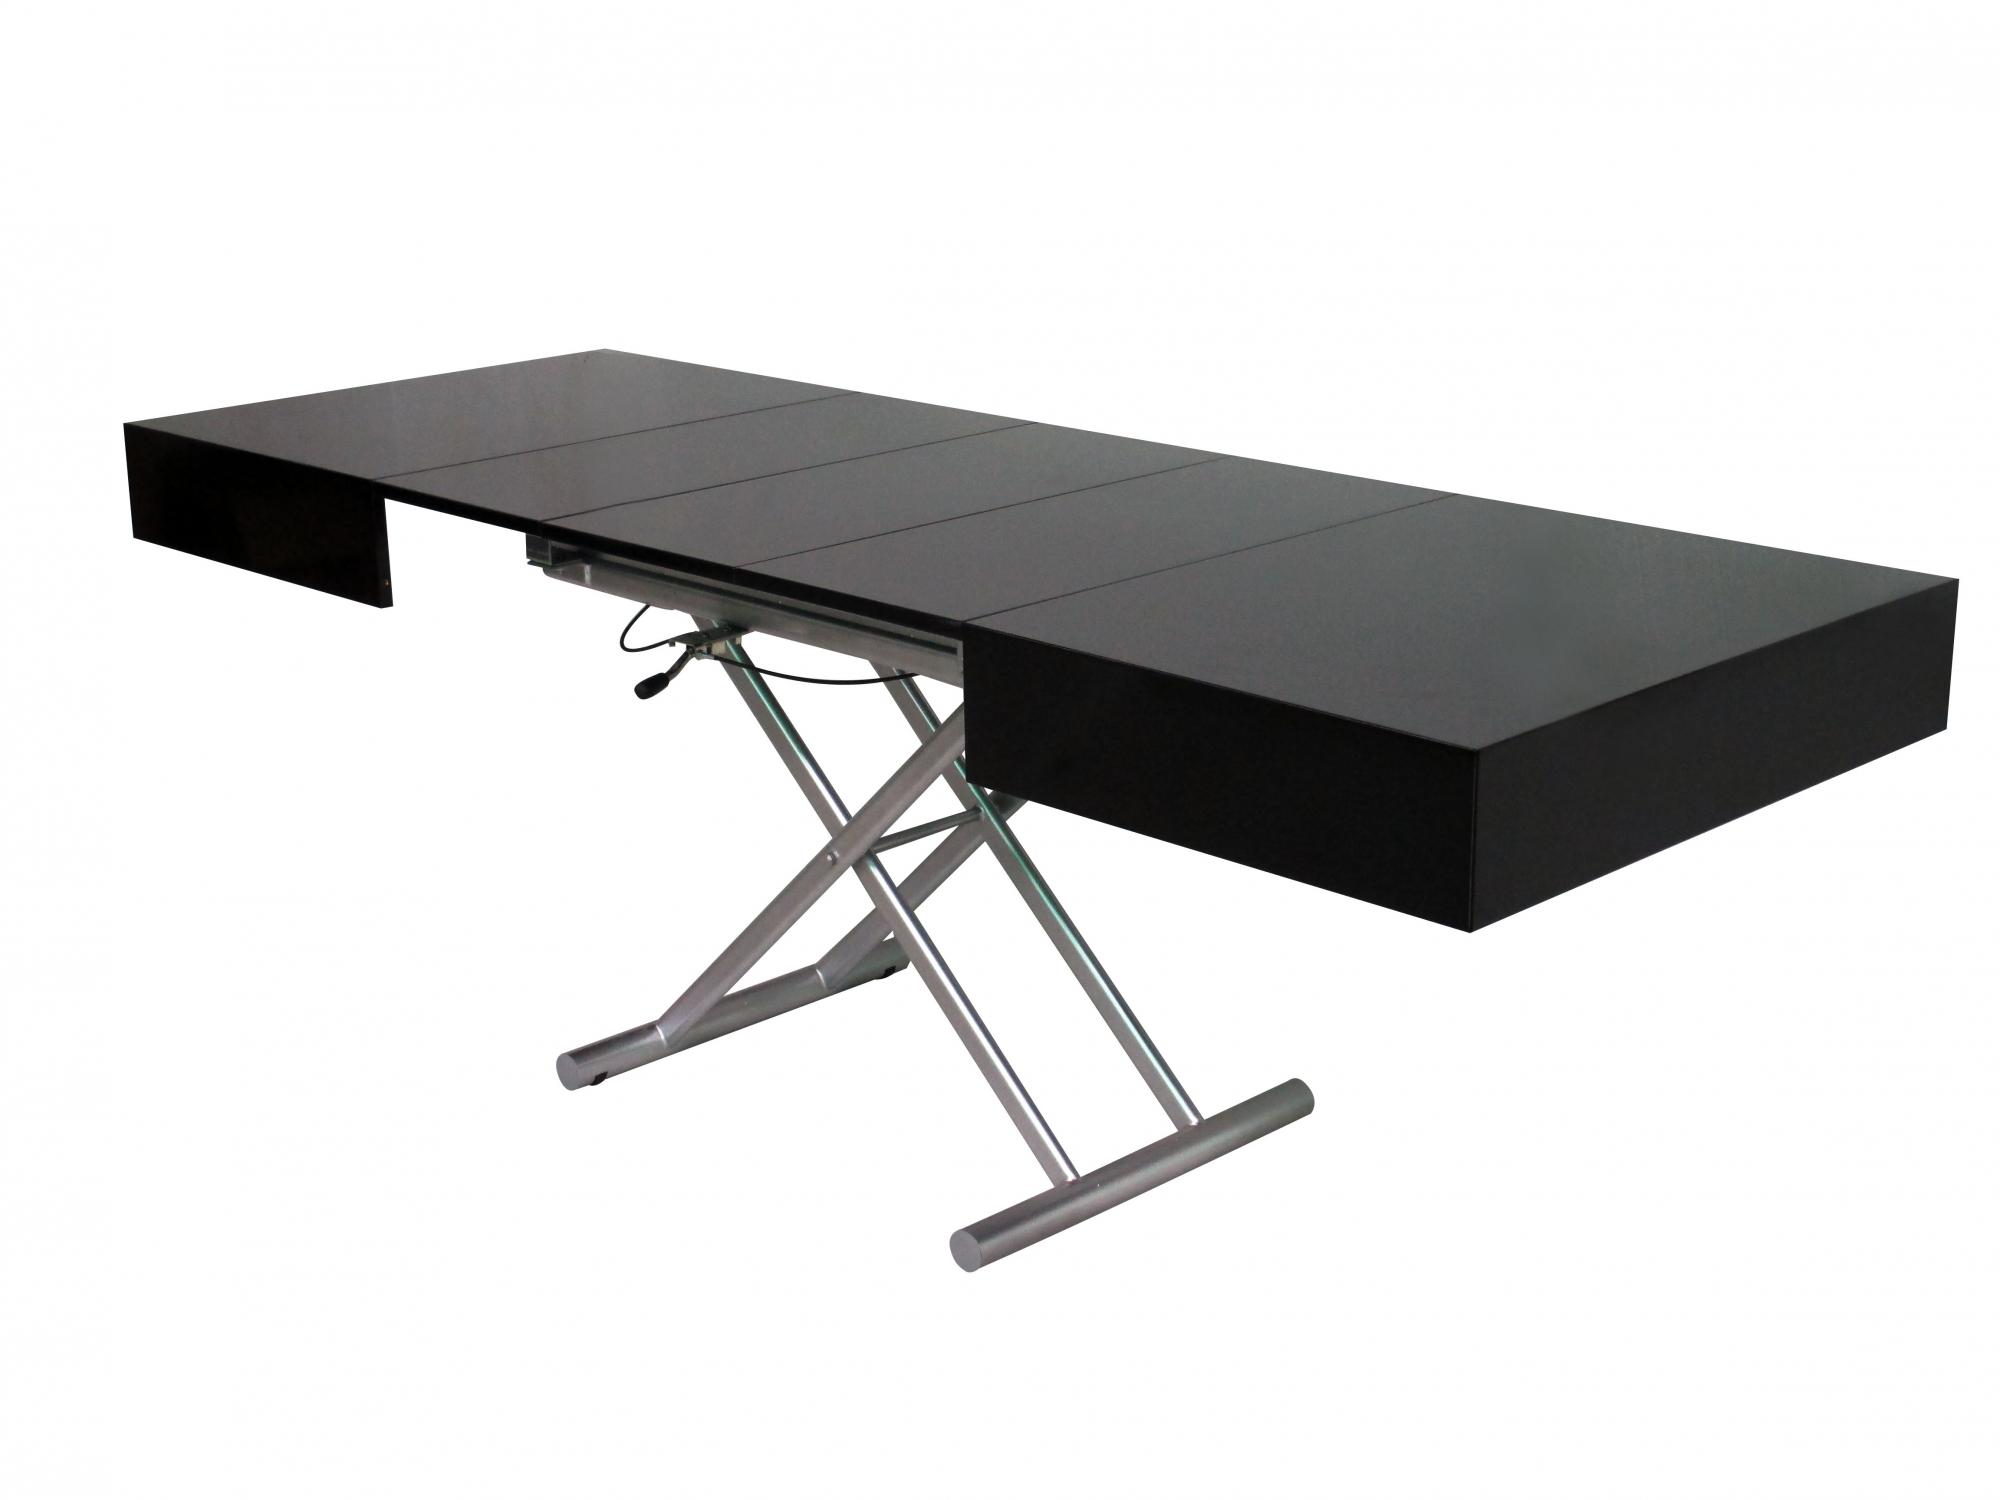 Mecanisme table basse relevable ikea